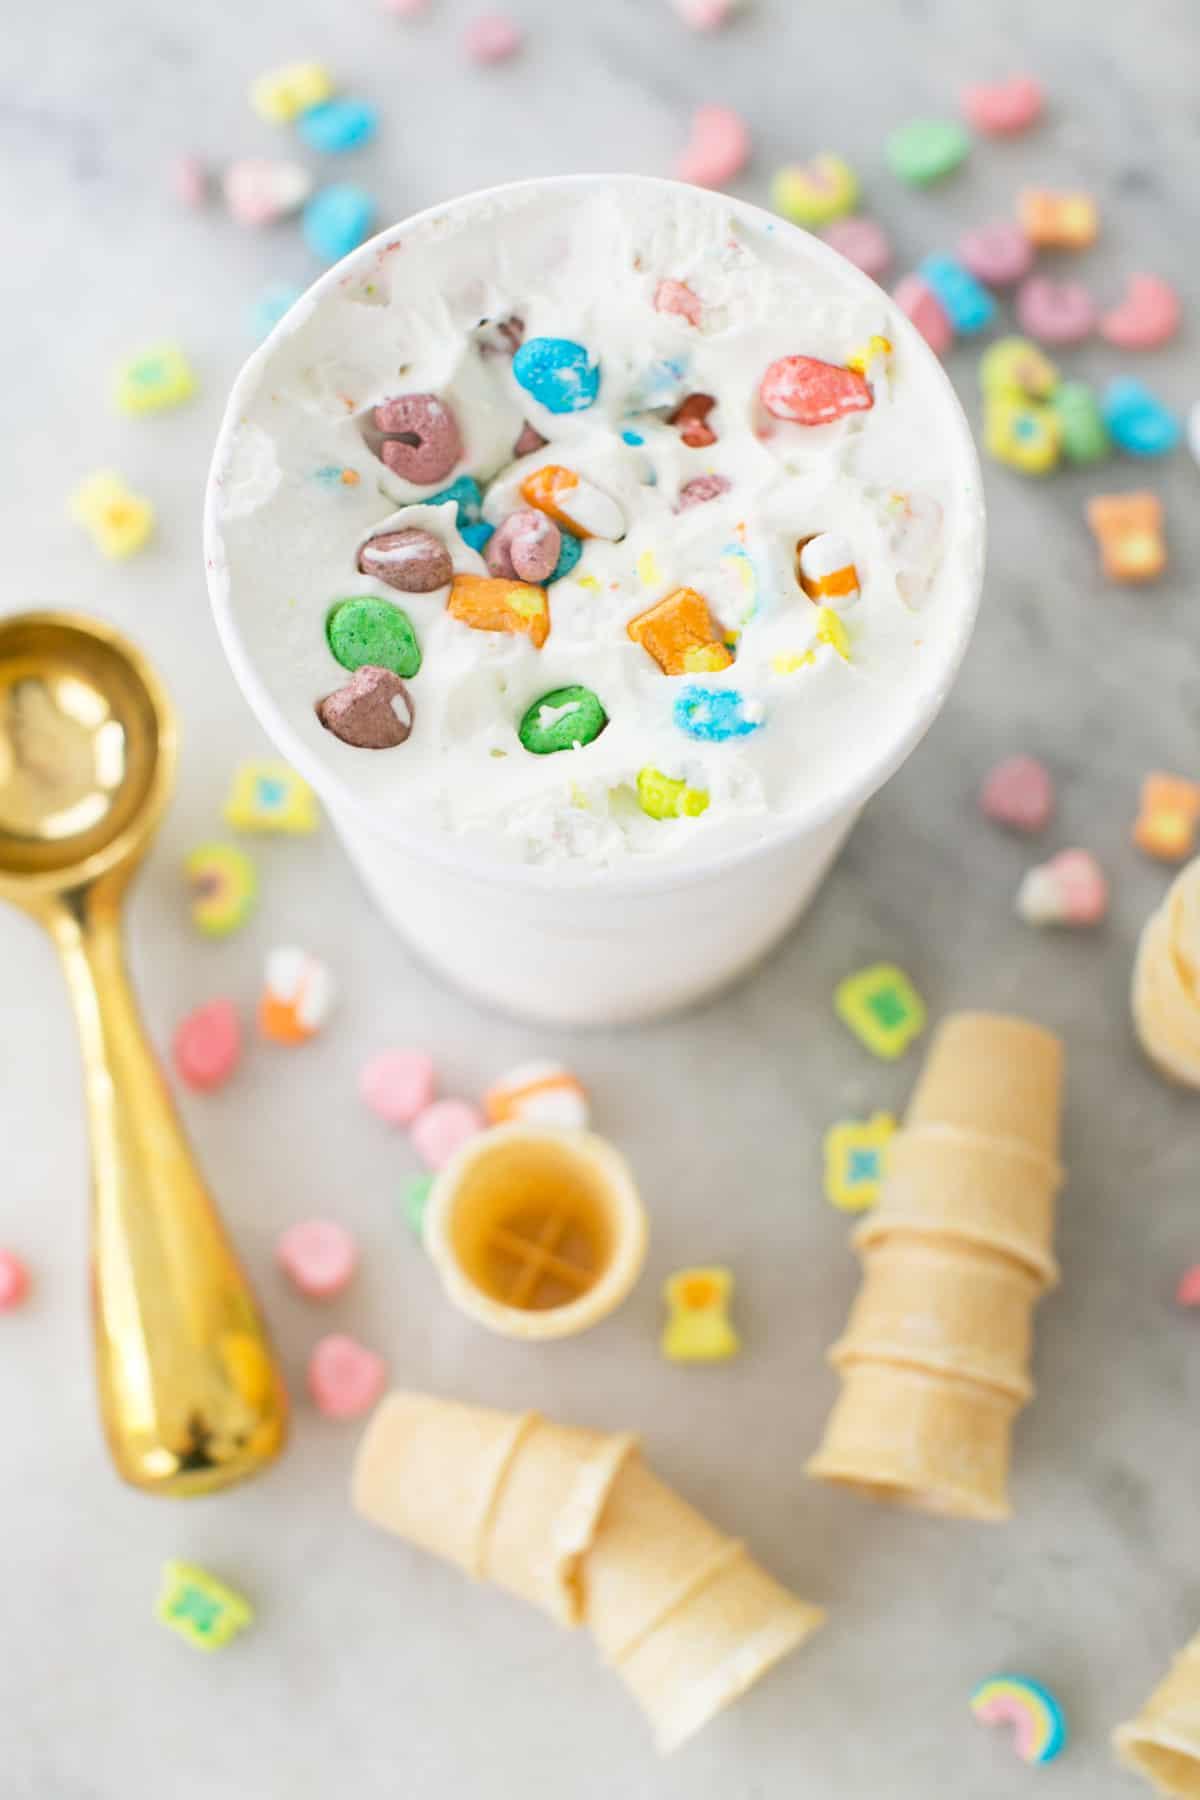 Lucky Charms Ice Cream Cake